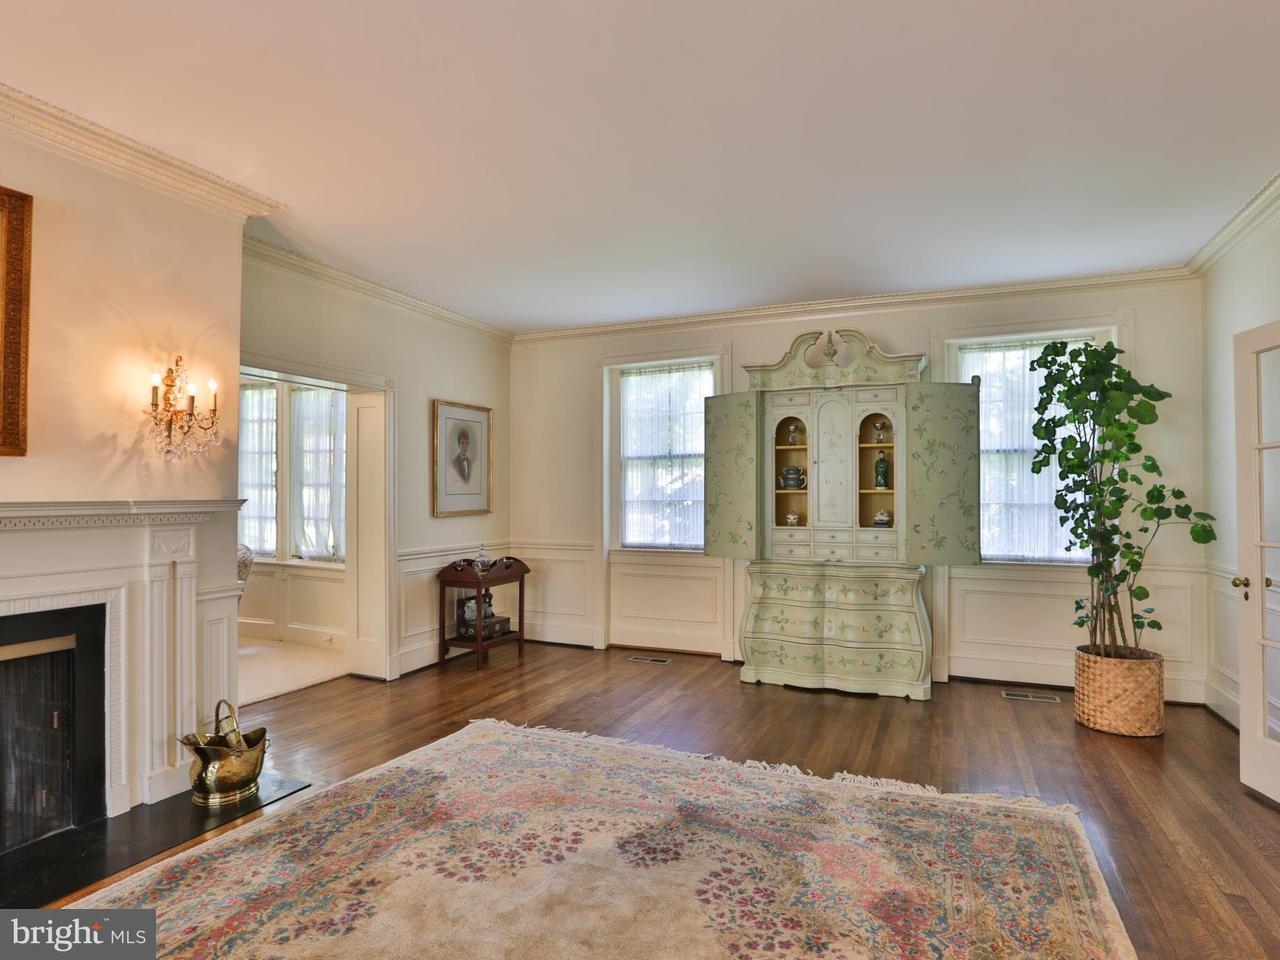 Additional photo for property listing at 3532 Massachusetts Ave Nw 3532 Massachusetts Ave Nw Washington, Περιφερεια Τησ Κολουμπια 20007 Ηνωμενεσ Πολιτειεσ